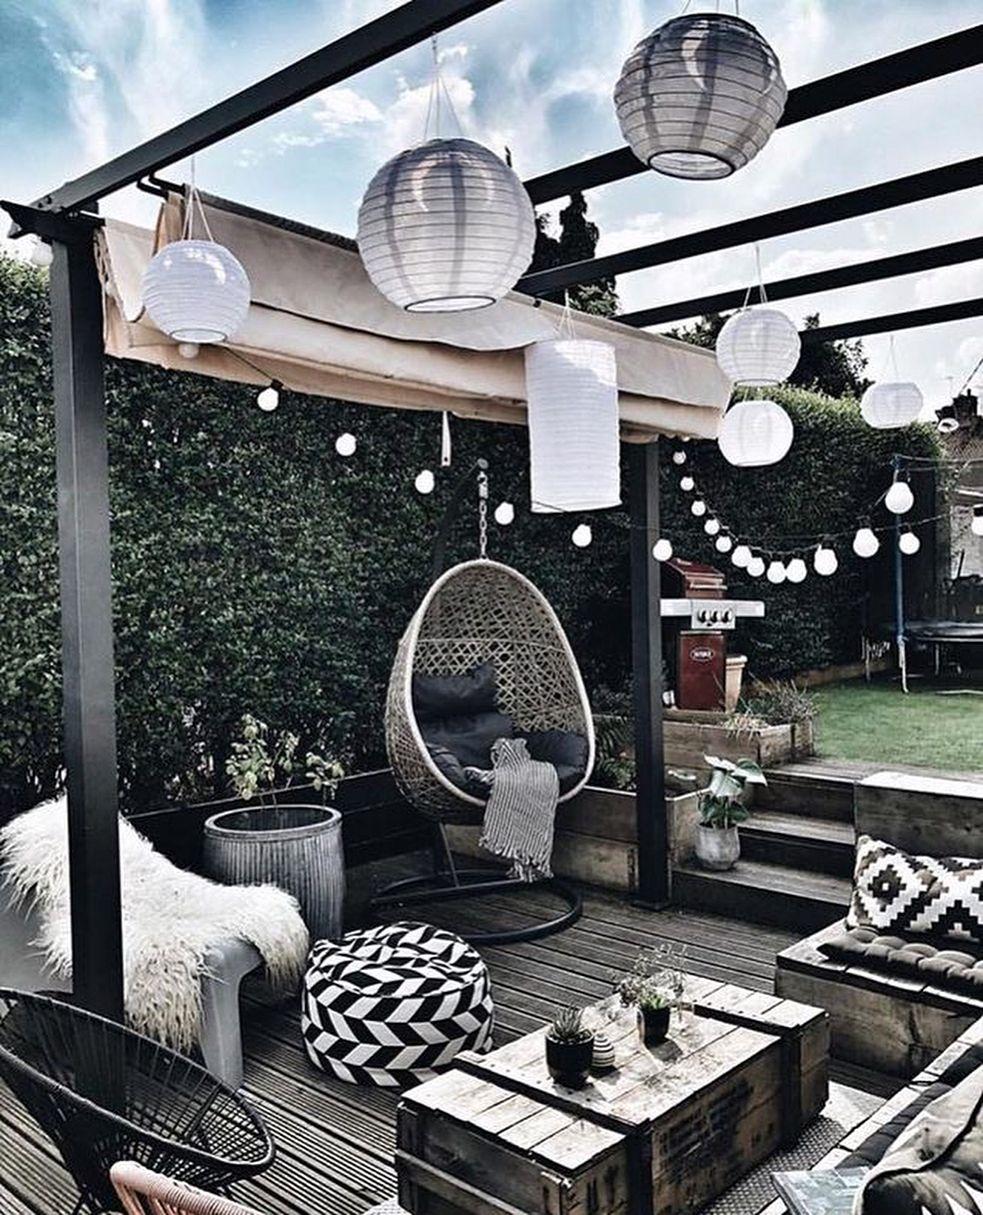 40 Brilliant Patio Design Ideas That Will Amaze - Gardenholic #patiodesign